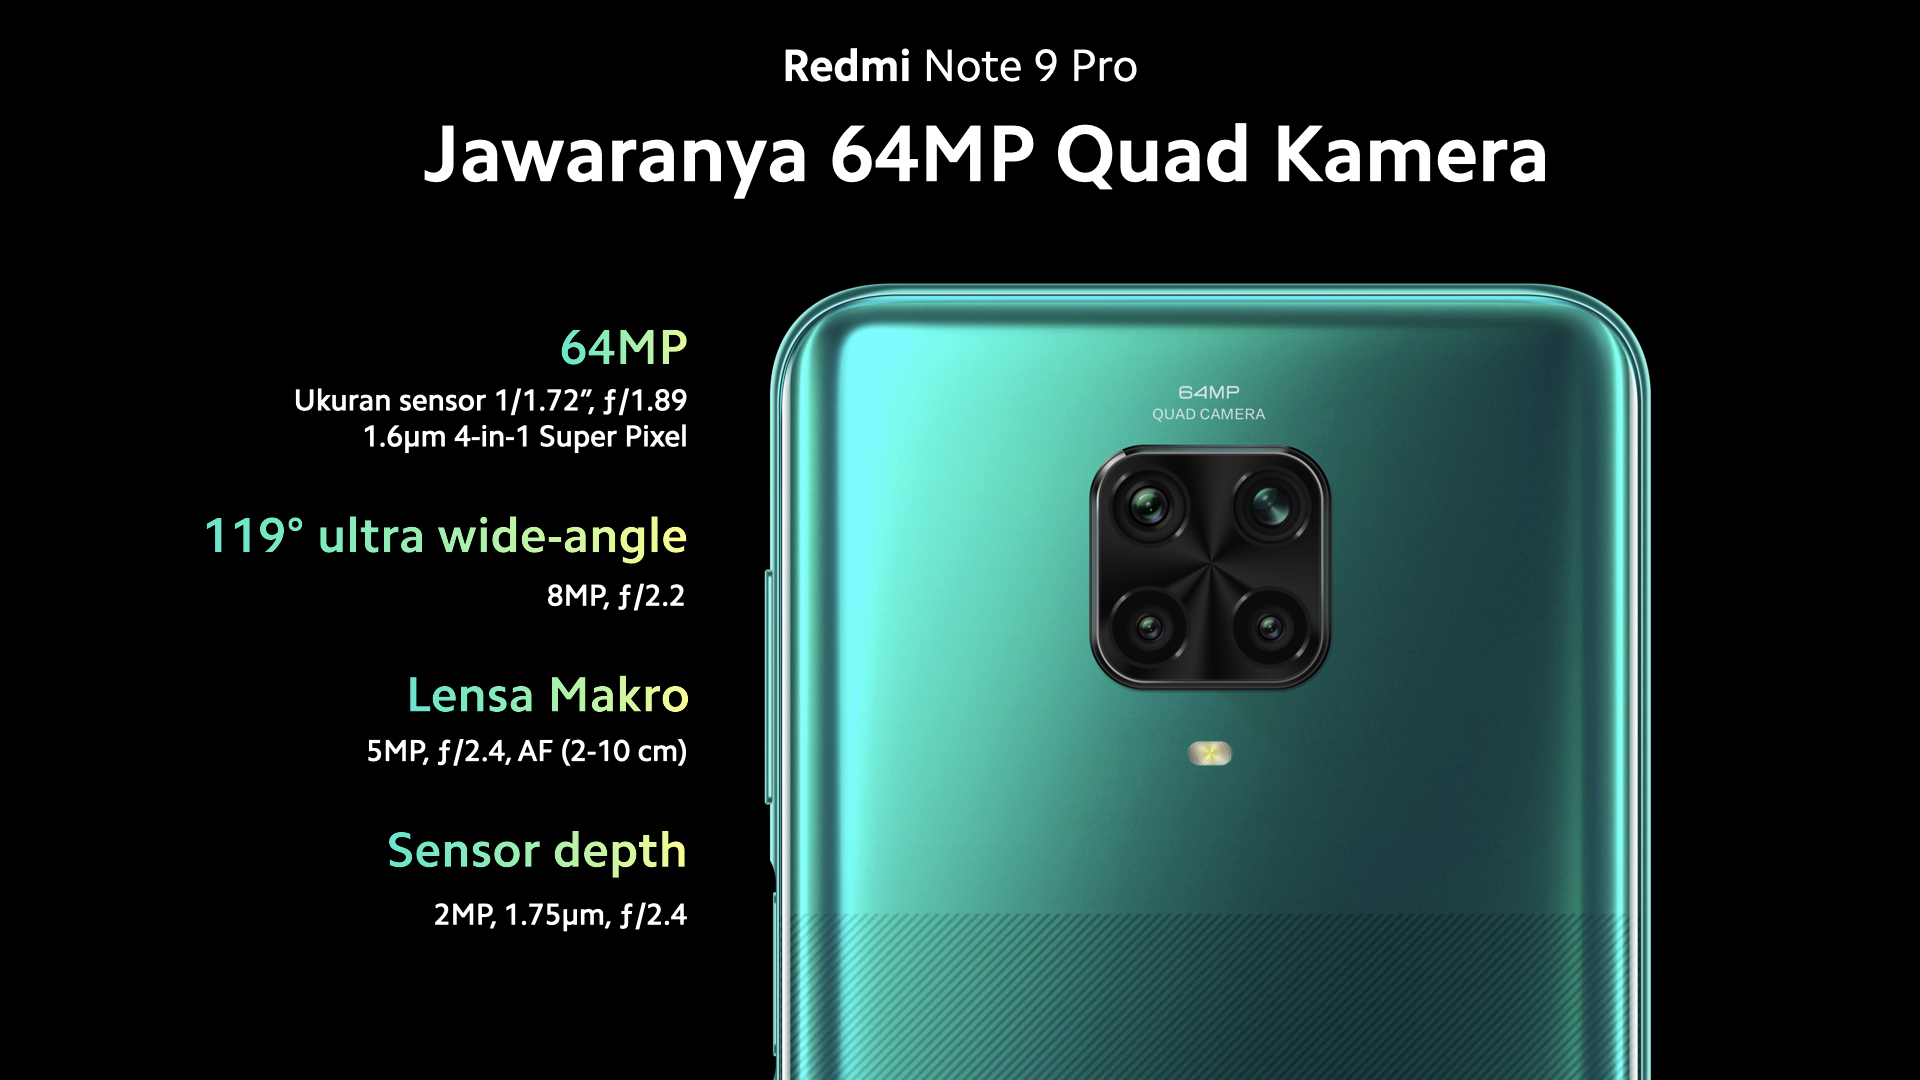 Spesifikasi kamera Redmi Note 9 Pro